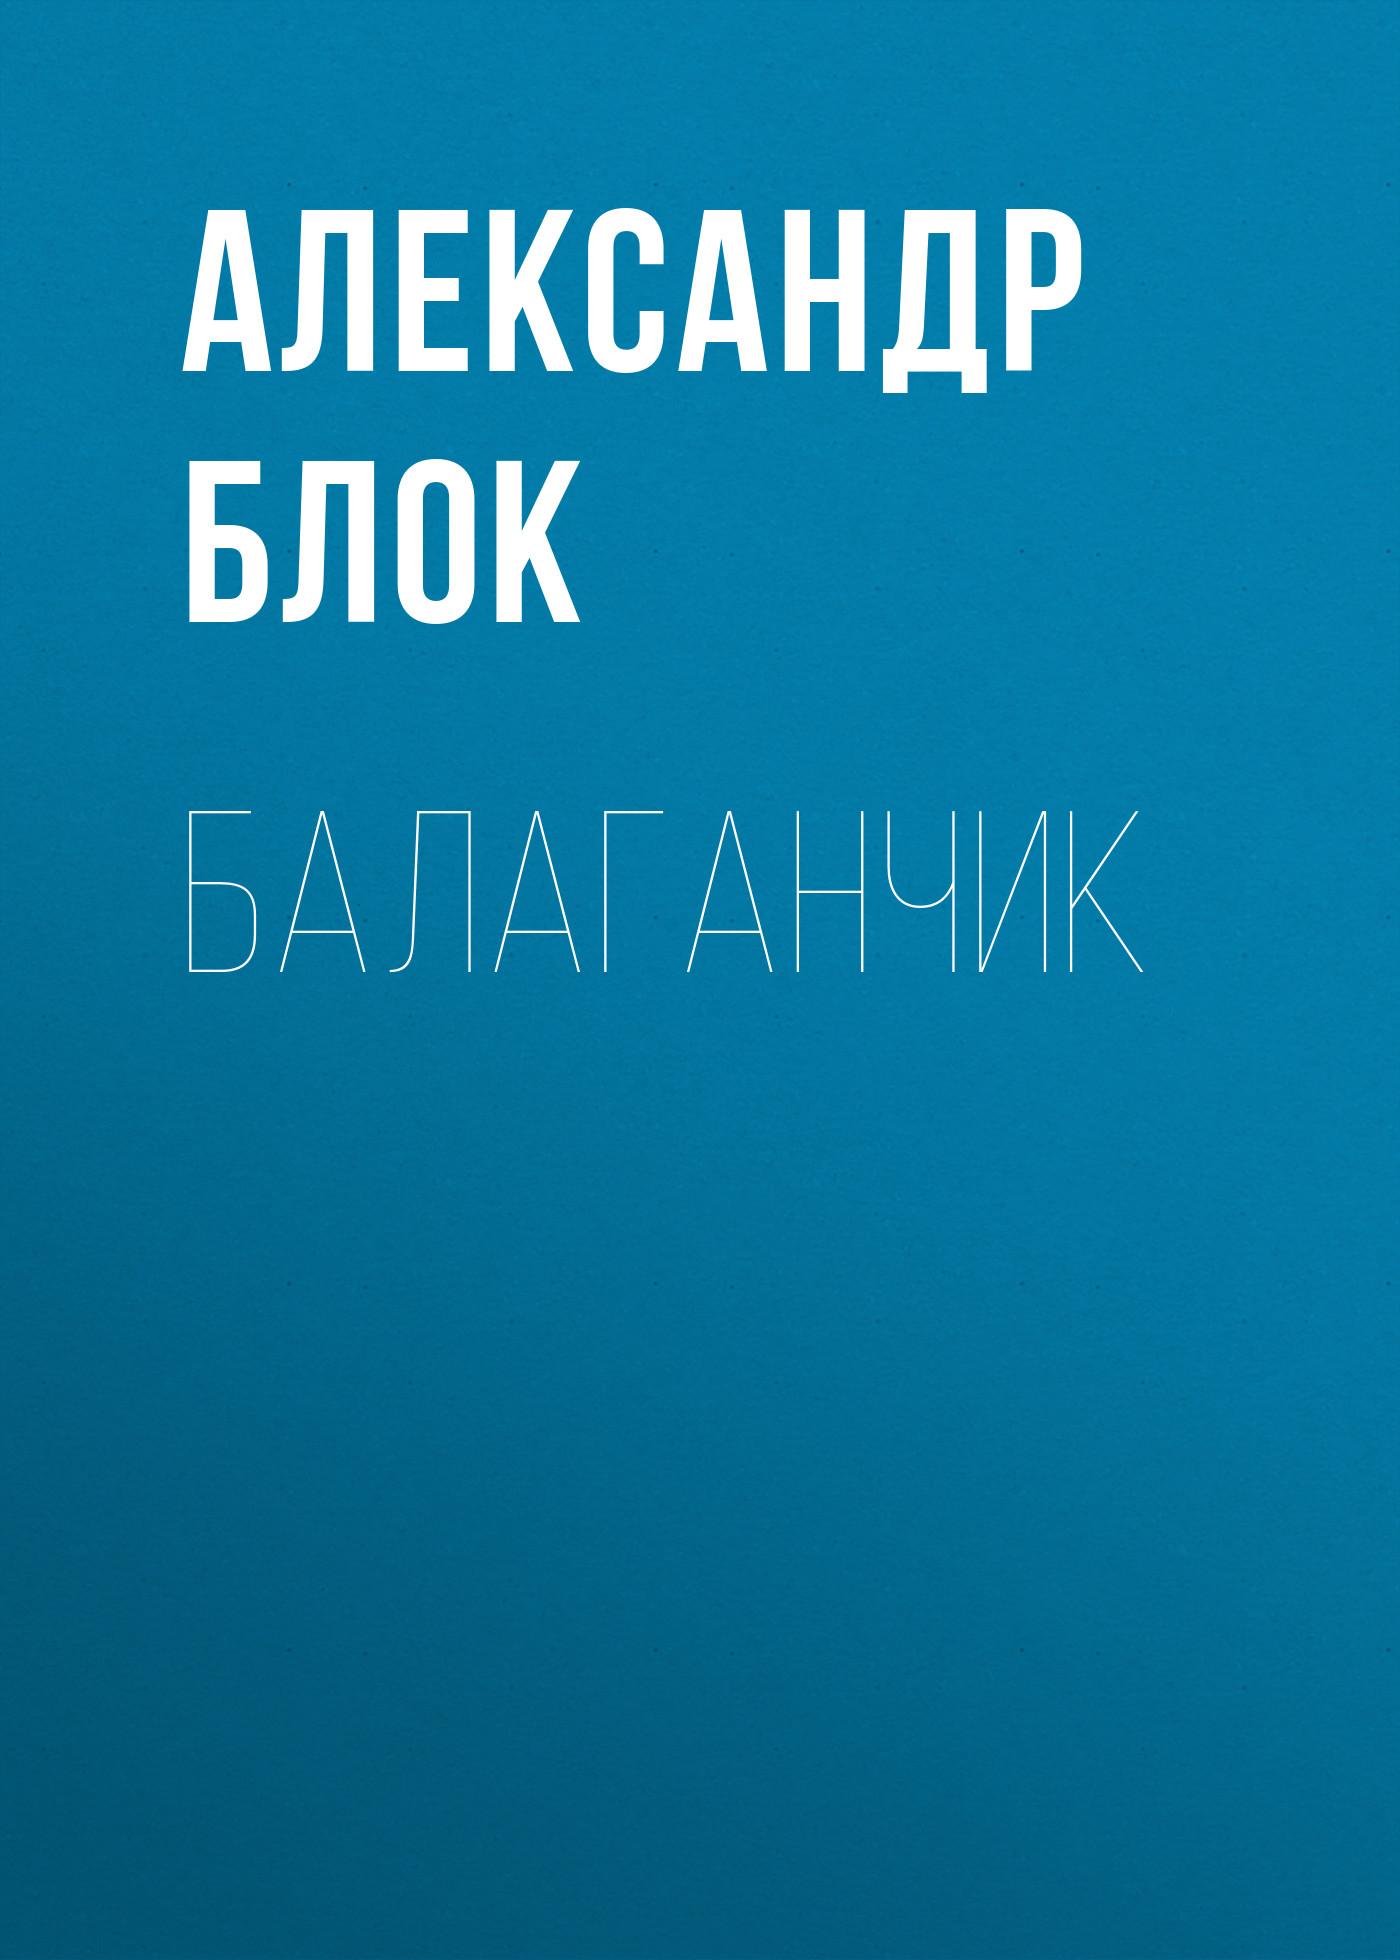 Купить книгу Балаганчик, автора Александра Блока